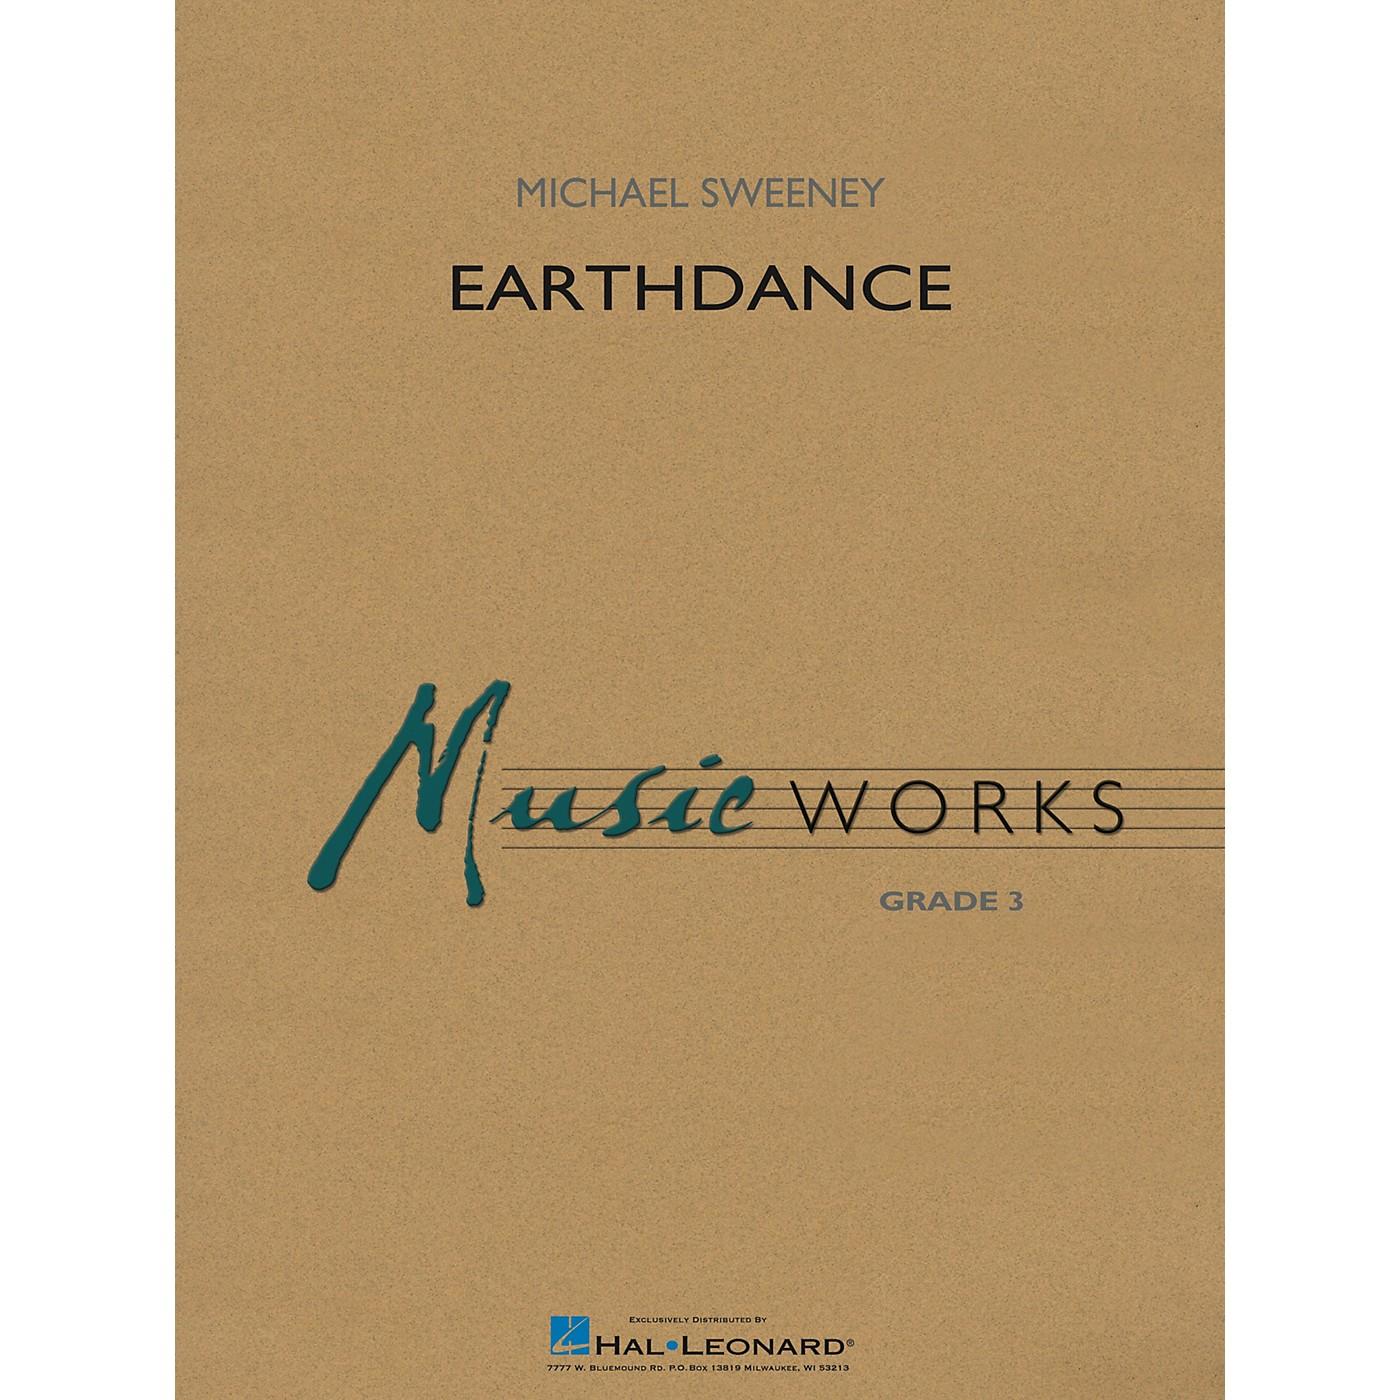 Hal Leonard Earthdance Concert Band Level 3 Composed by Michael Sweeney thumbnail